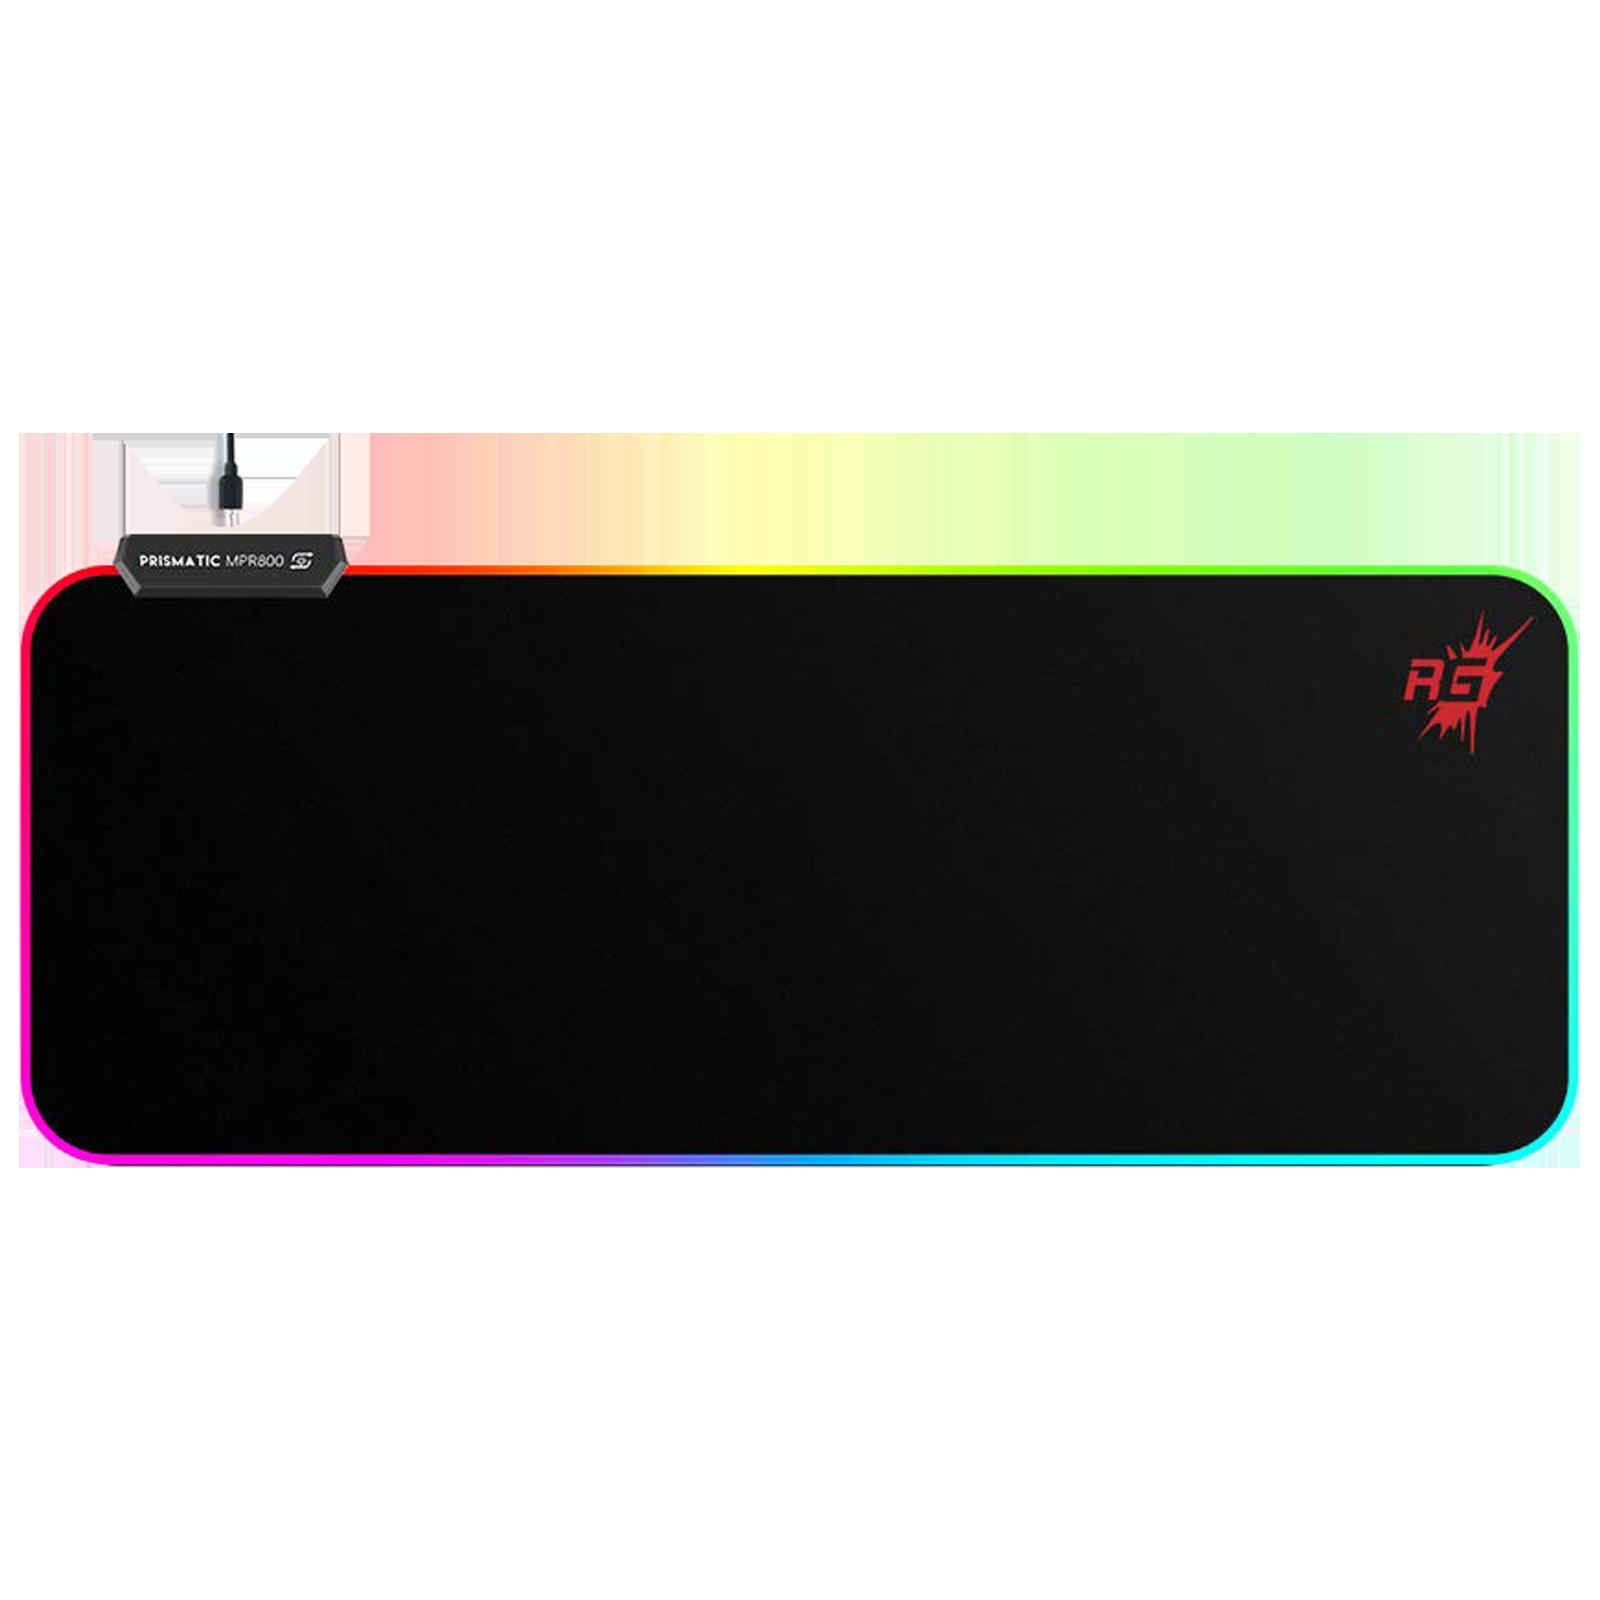 Redgear MPR800 Gaming Mousepad (4 LED Spectrum Modes, 8904130846038, Black)_1